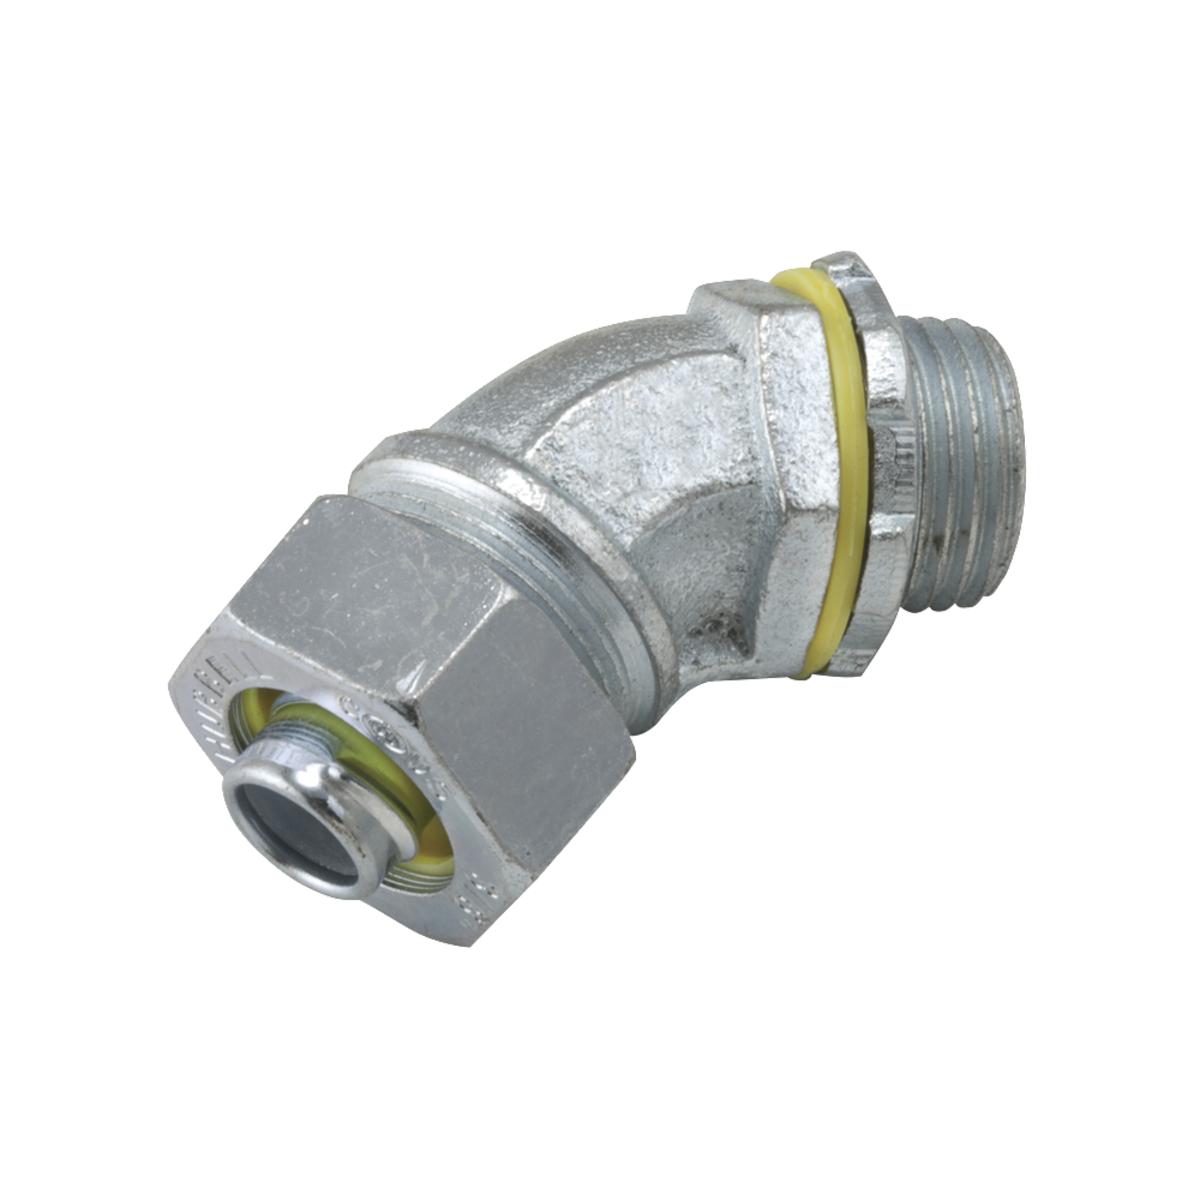 Hubbell-Raco 3444 Conduit Connector